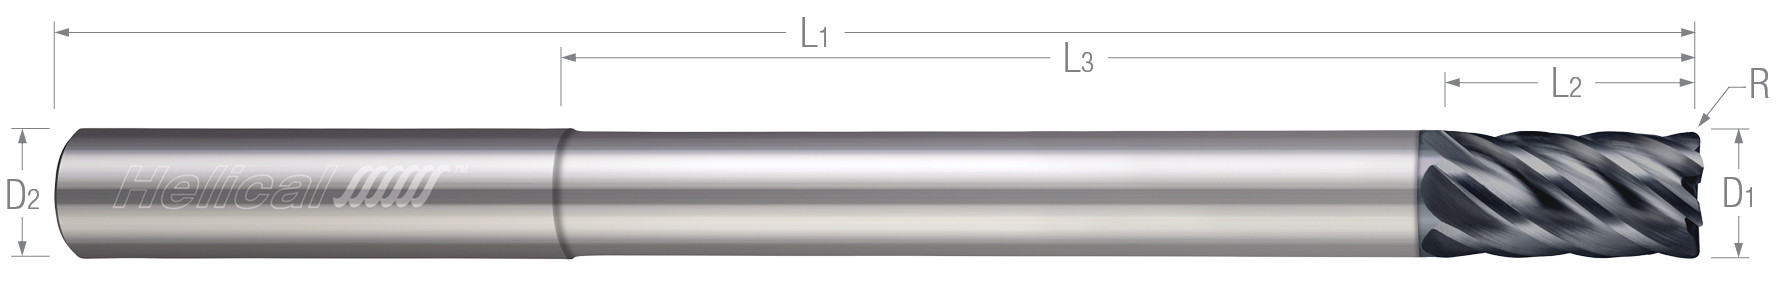 tool-details-82618